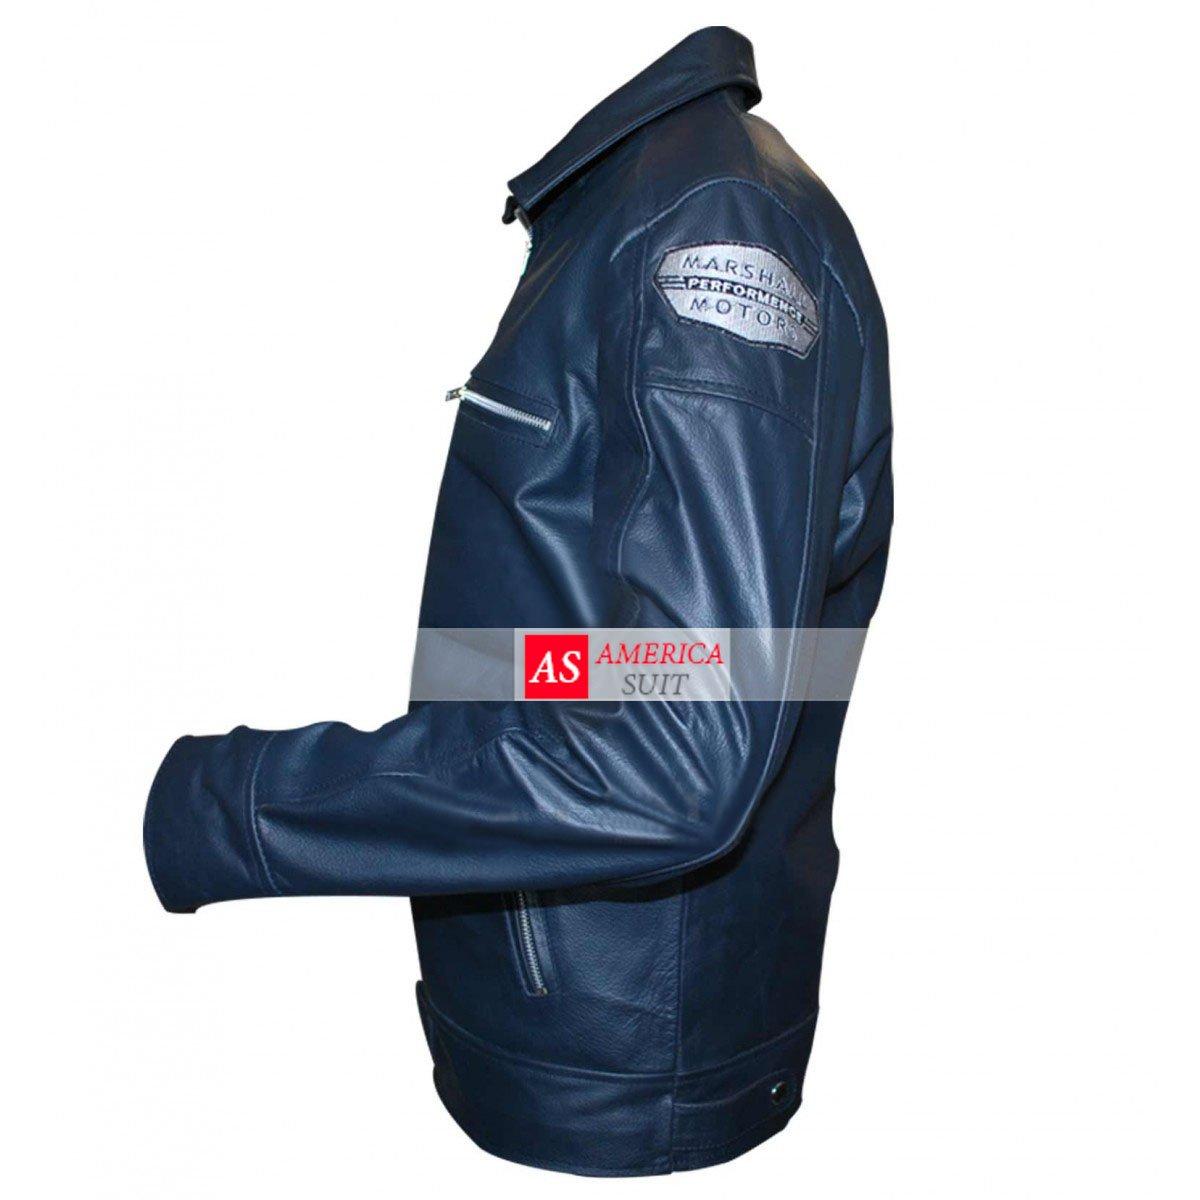 Need For Speed Aaron Paul Blue Jacket